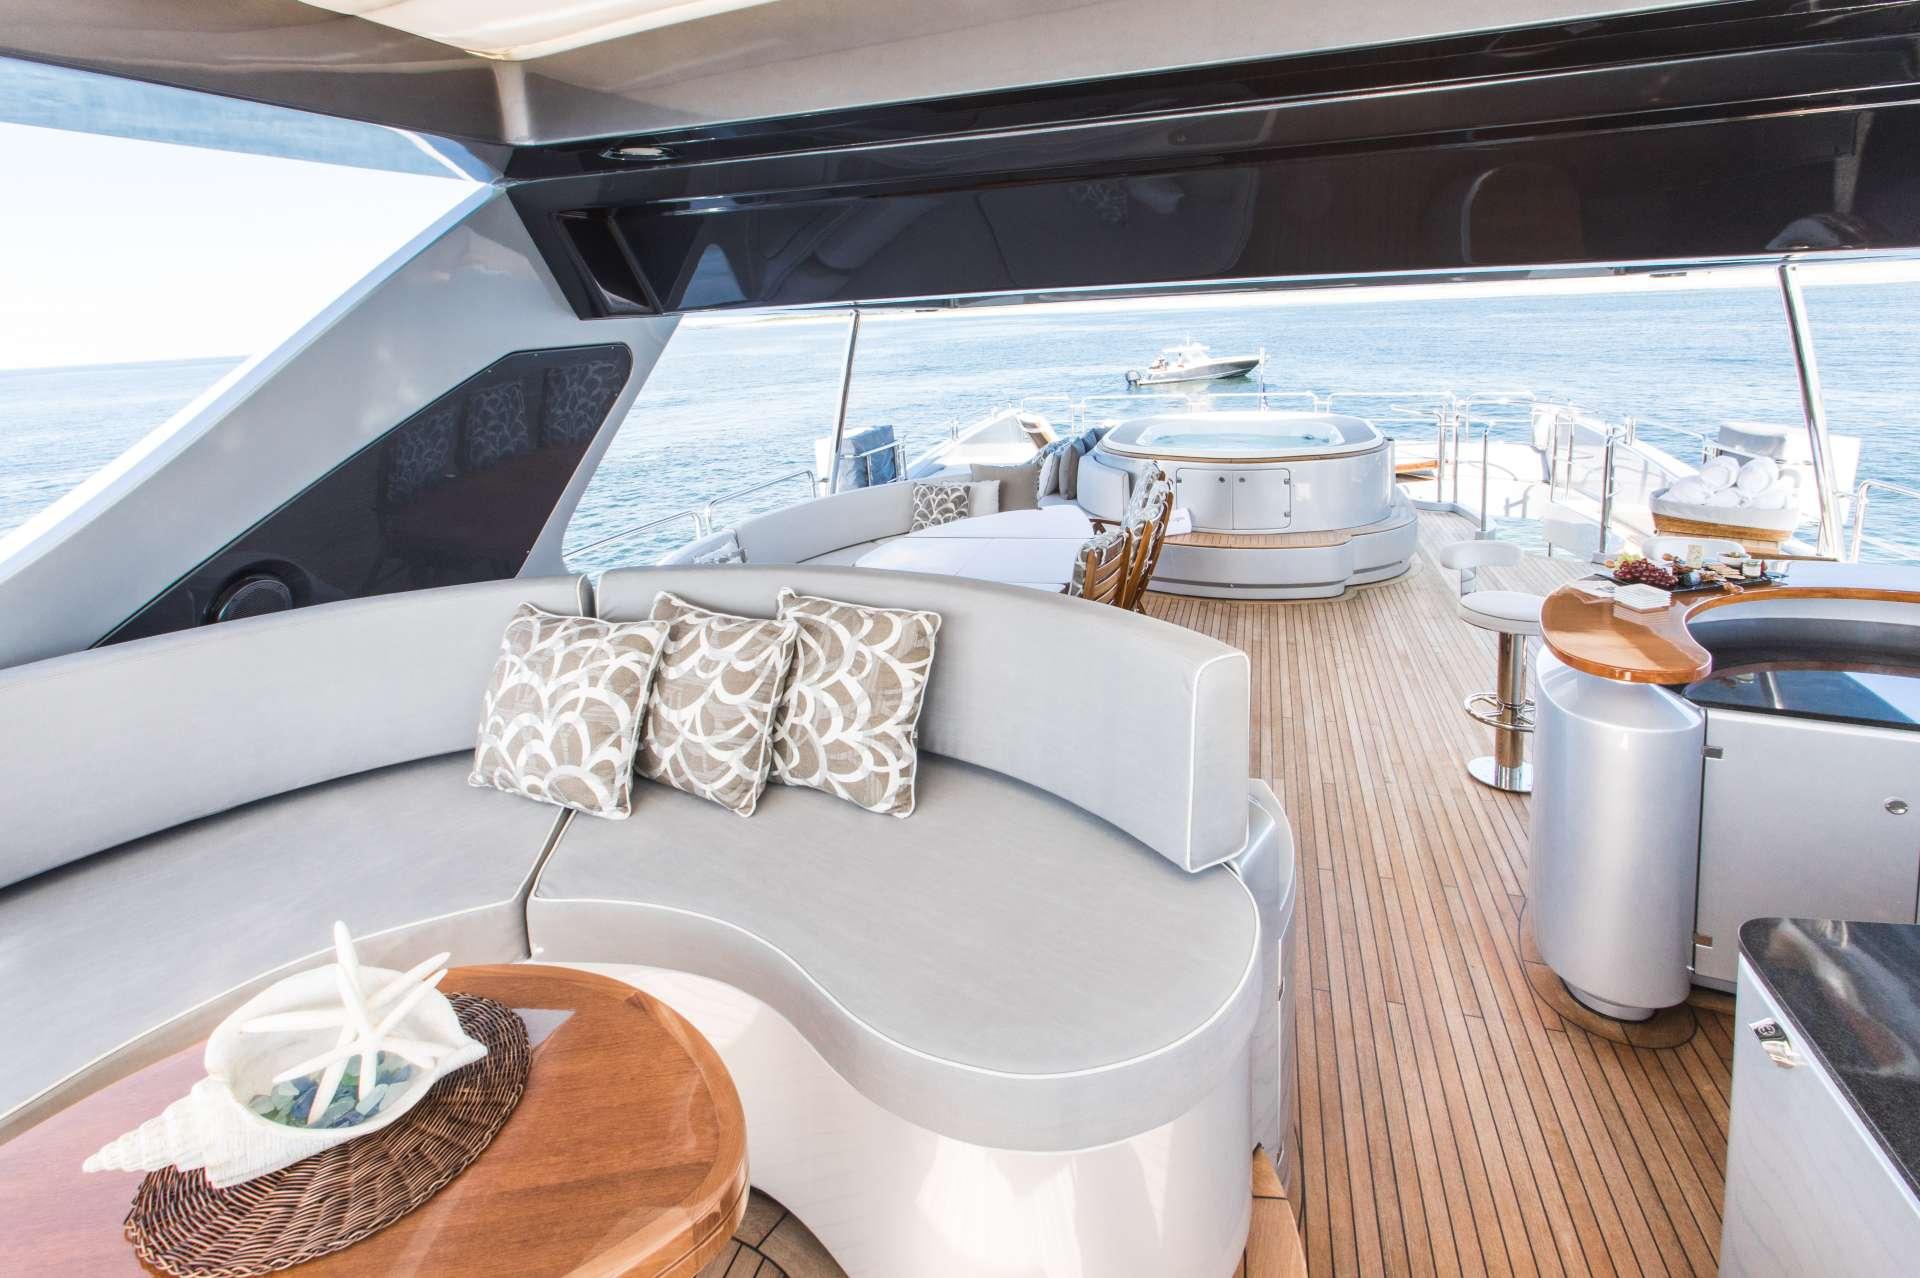 Motor Yacht 'TAIL LIGHTS' Flybridge Aft View, 12 PAX, 6 Crew, 116.00 Ft, 35.00 Meters, Built 2011, Azimut, Refit Year 2016